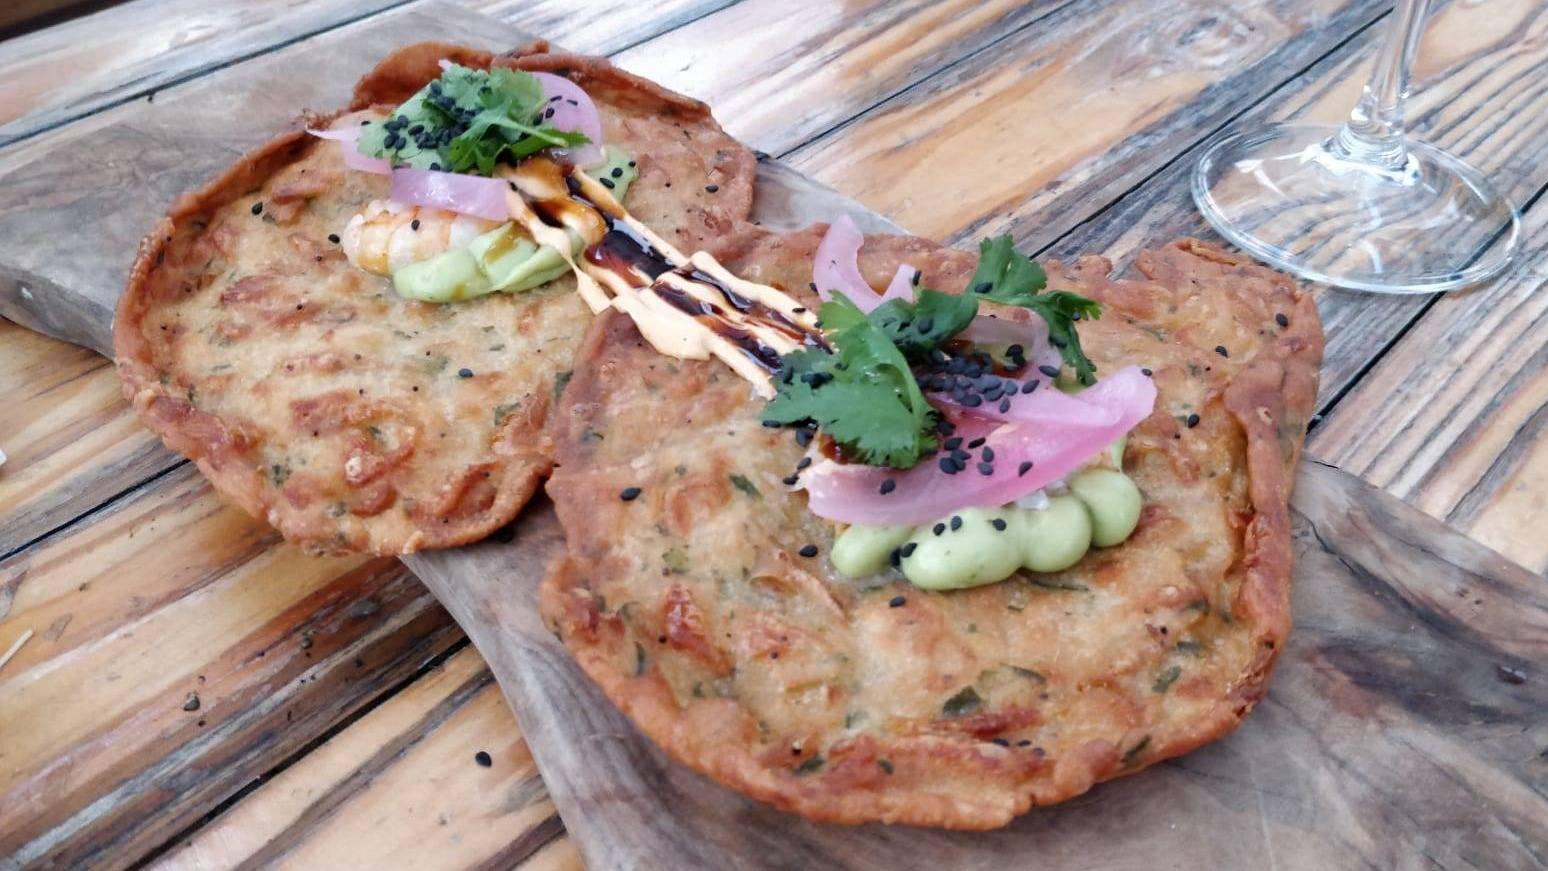 South Crispy Camaron Omelette With wassabi Mayo